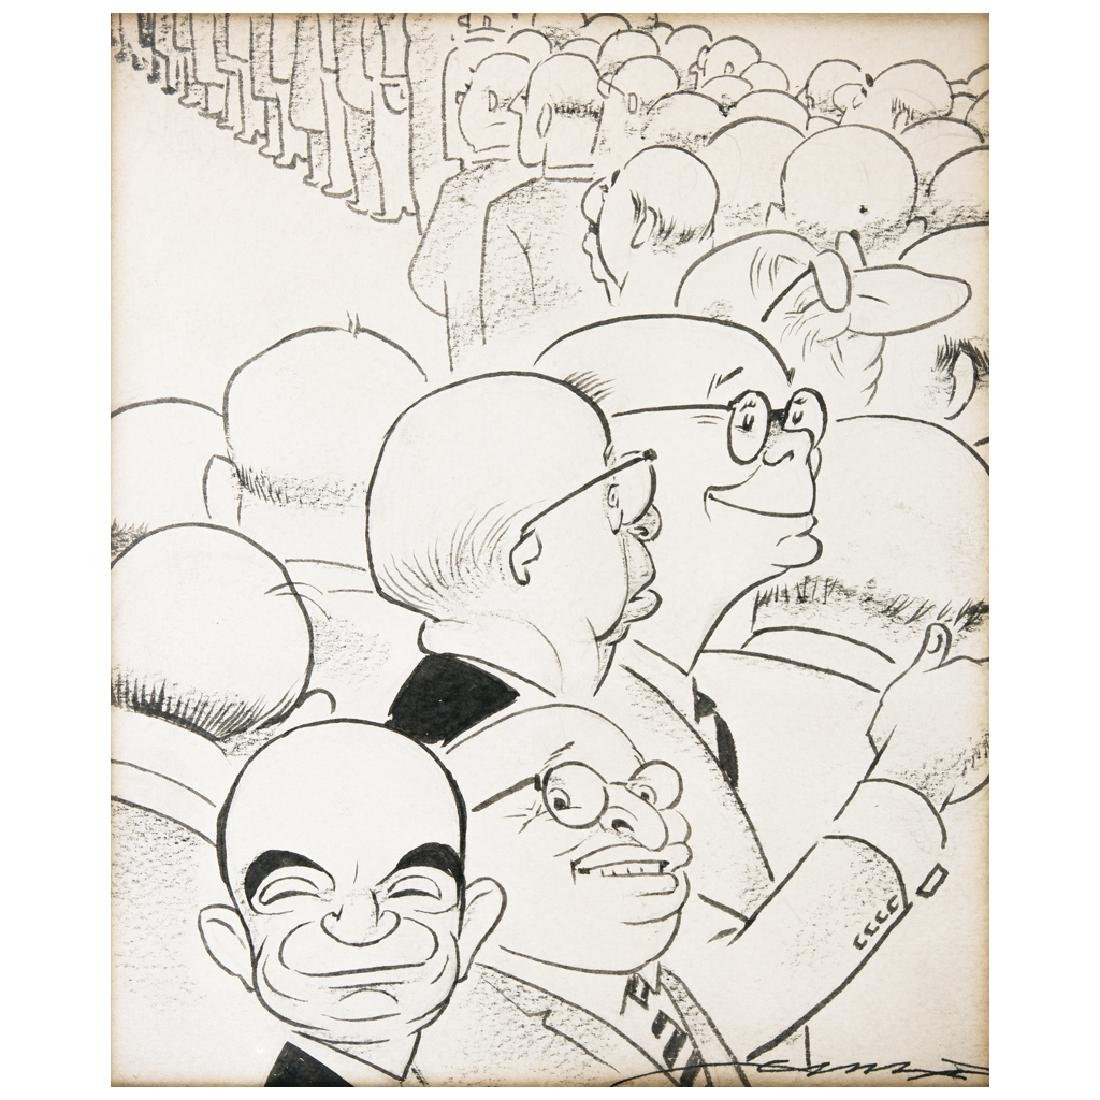 EL CHANGO GARCiA CABRAL, Untitled, Signed, Ink on